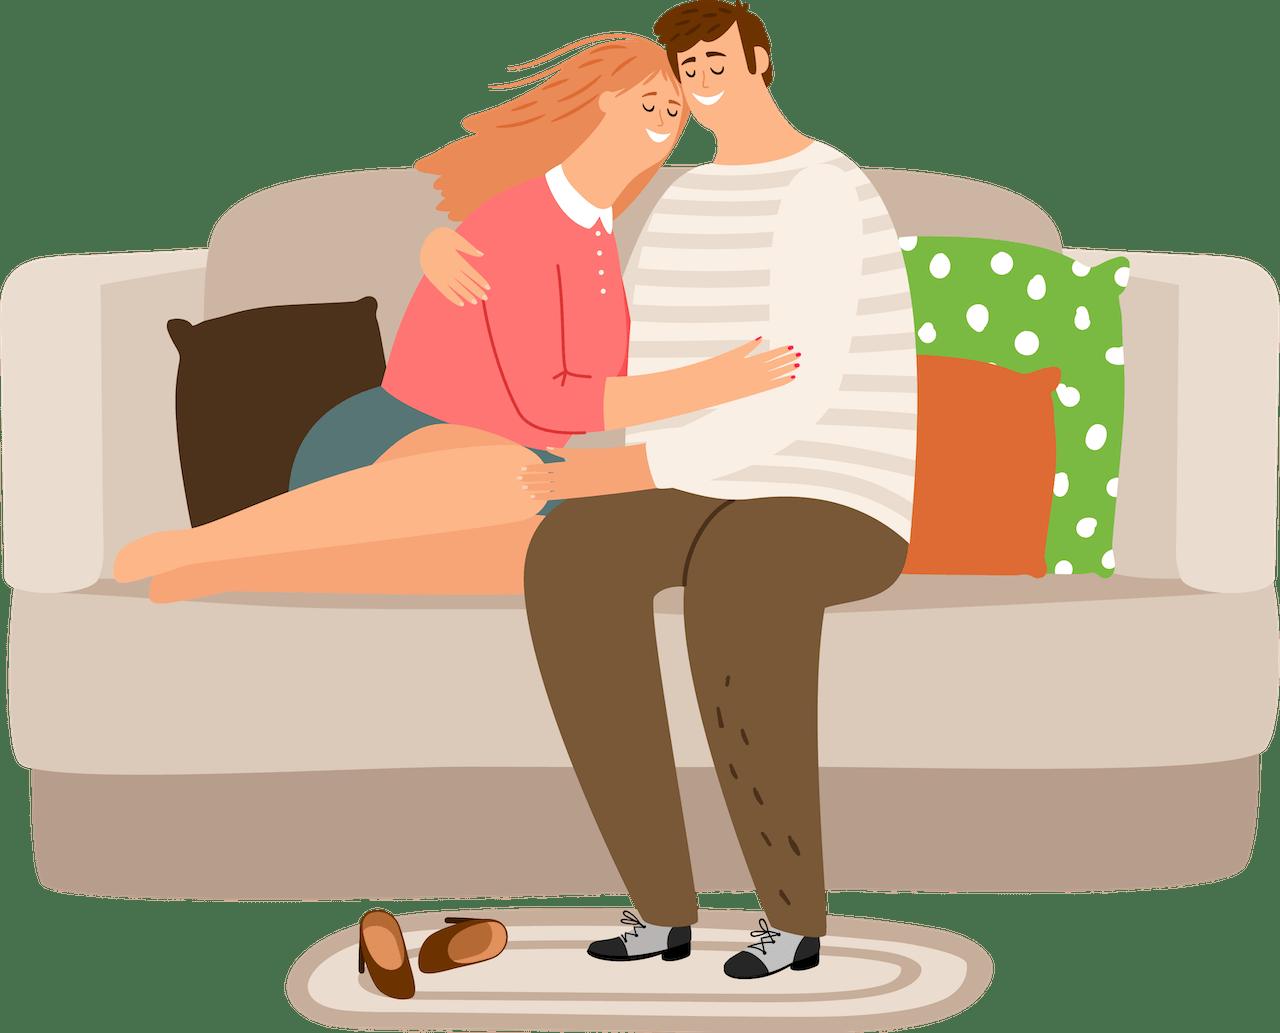 couple - sofa hugging